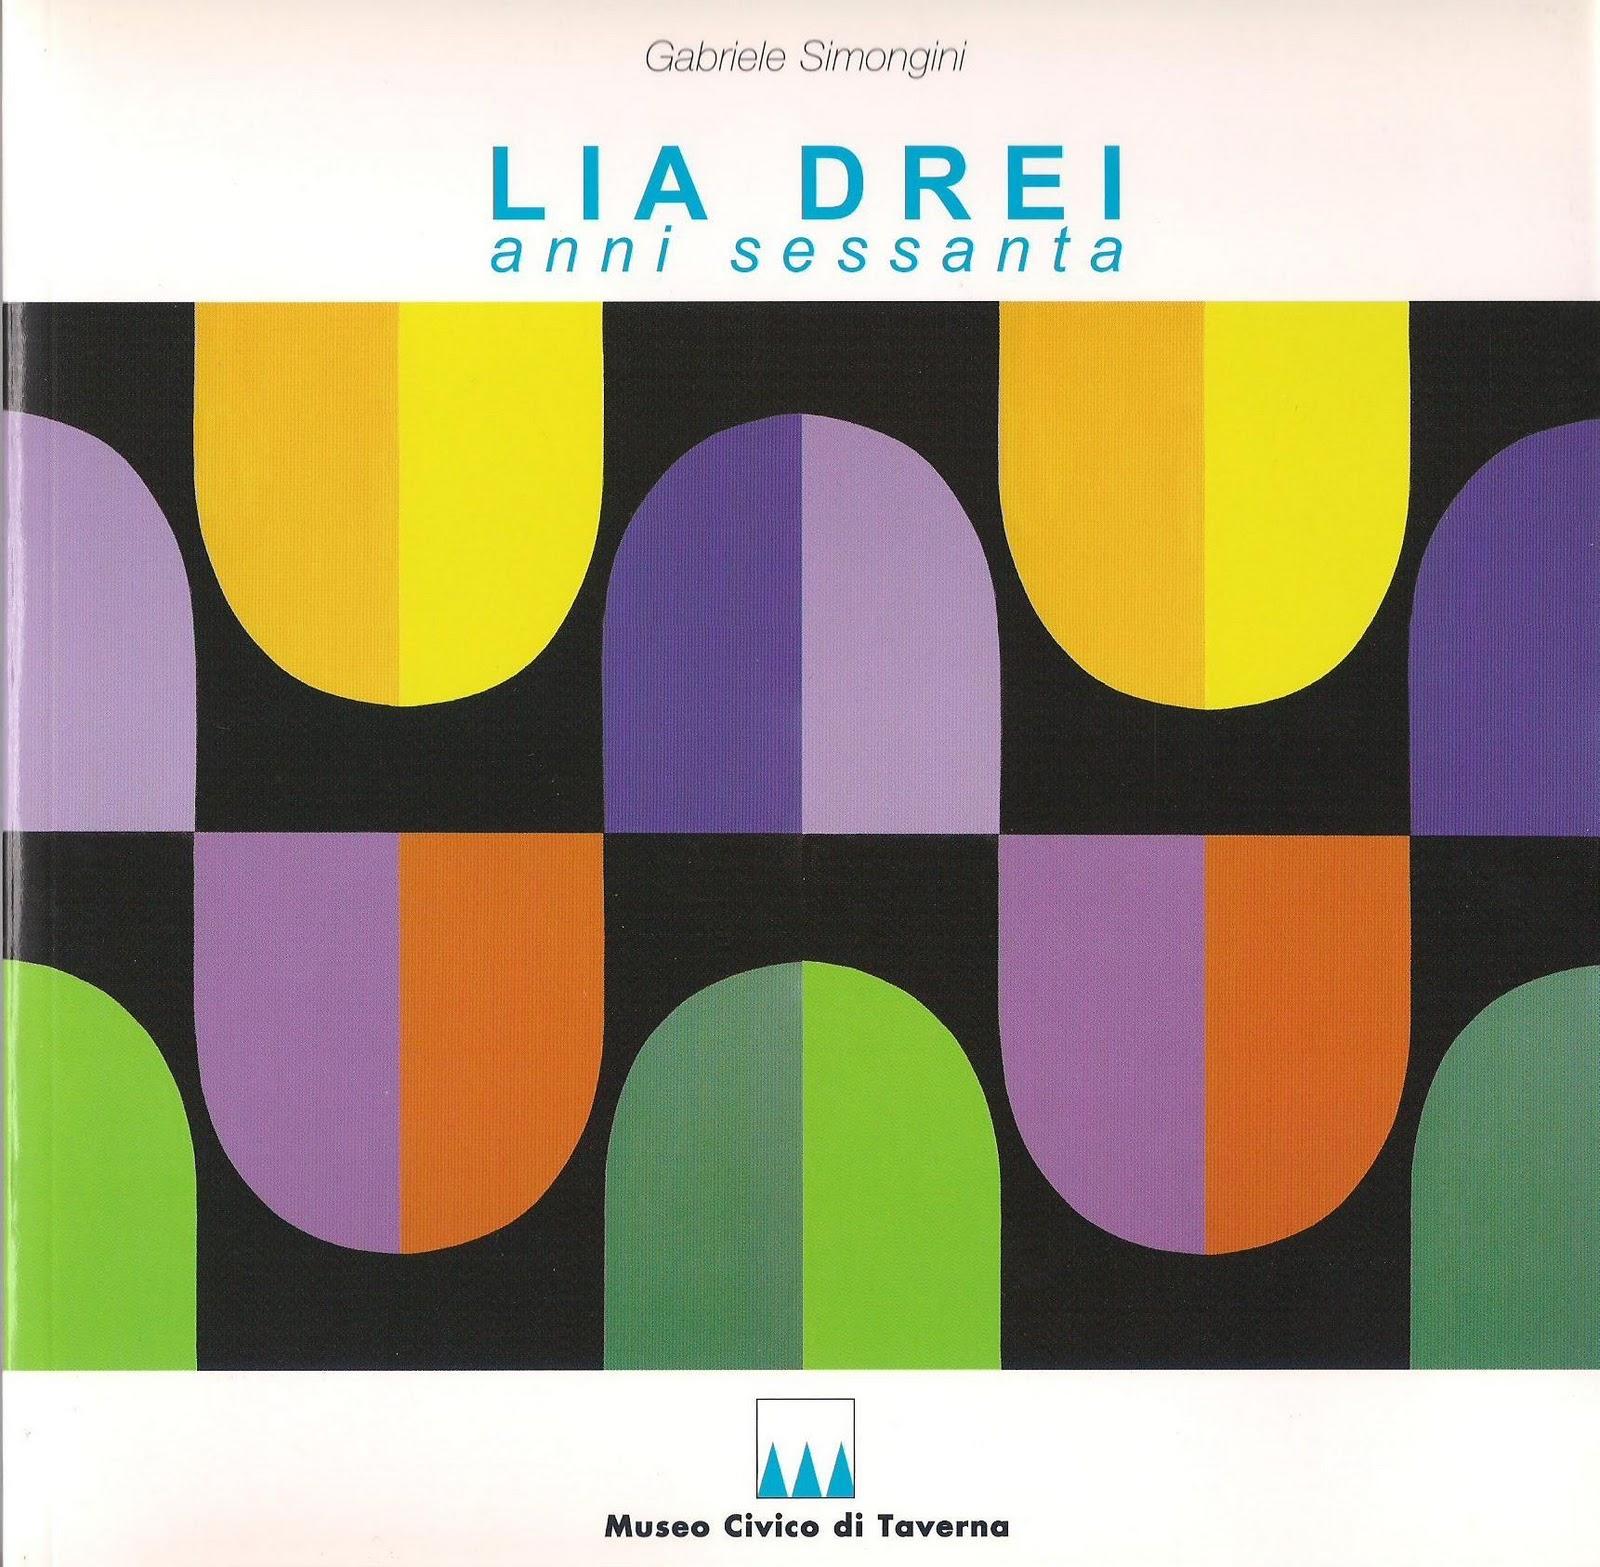 Lia Drei: pensieri e parole di una vita vissuta nell'arte